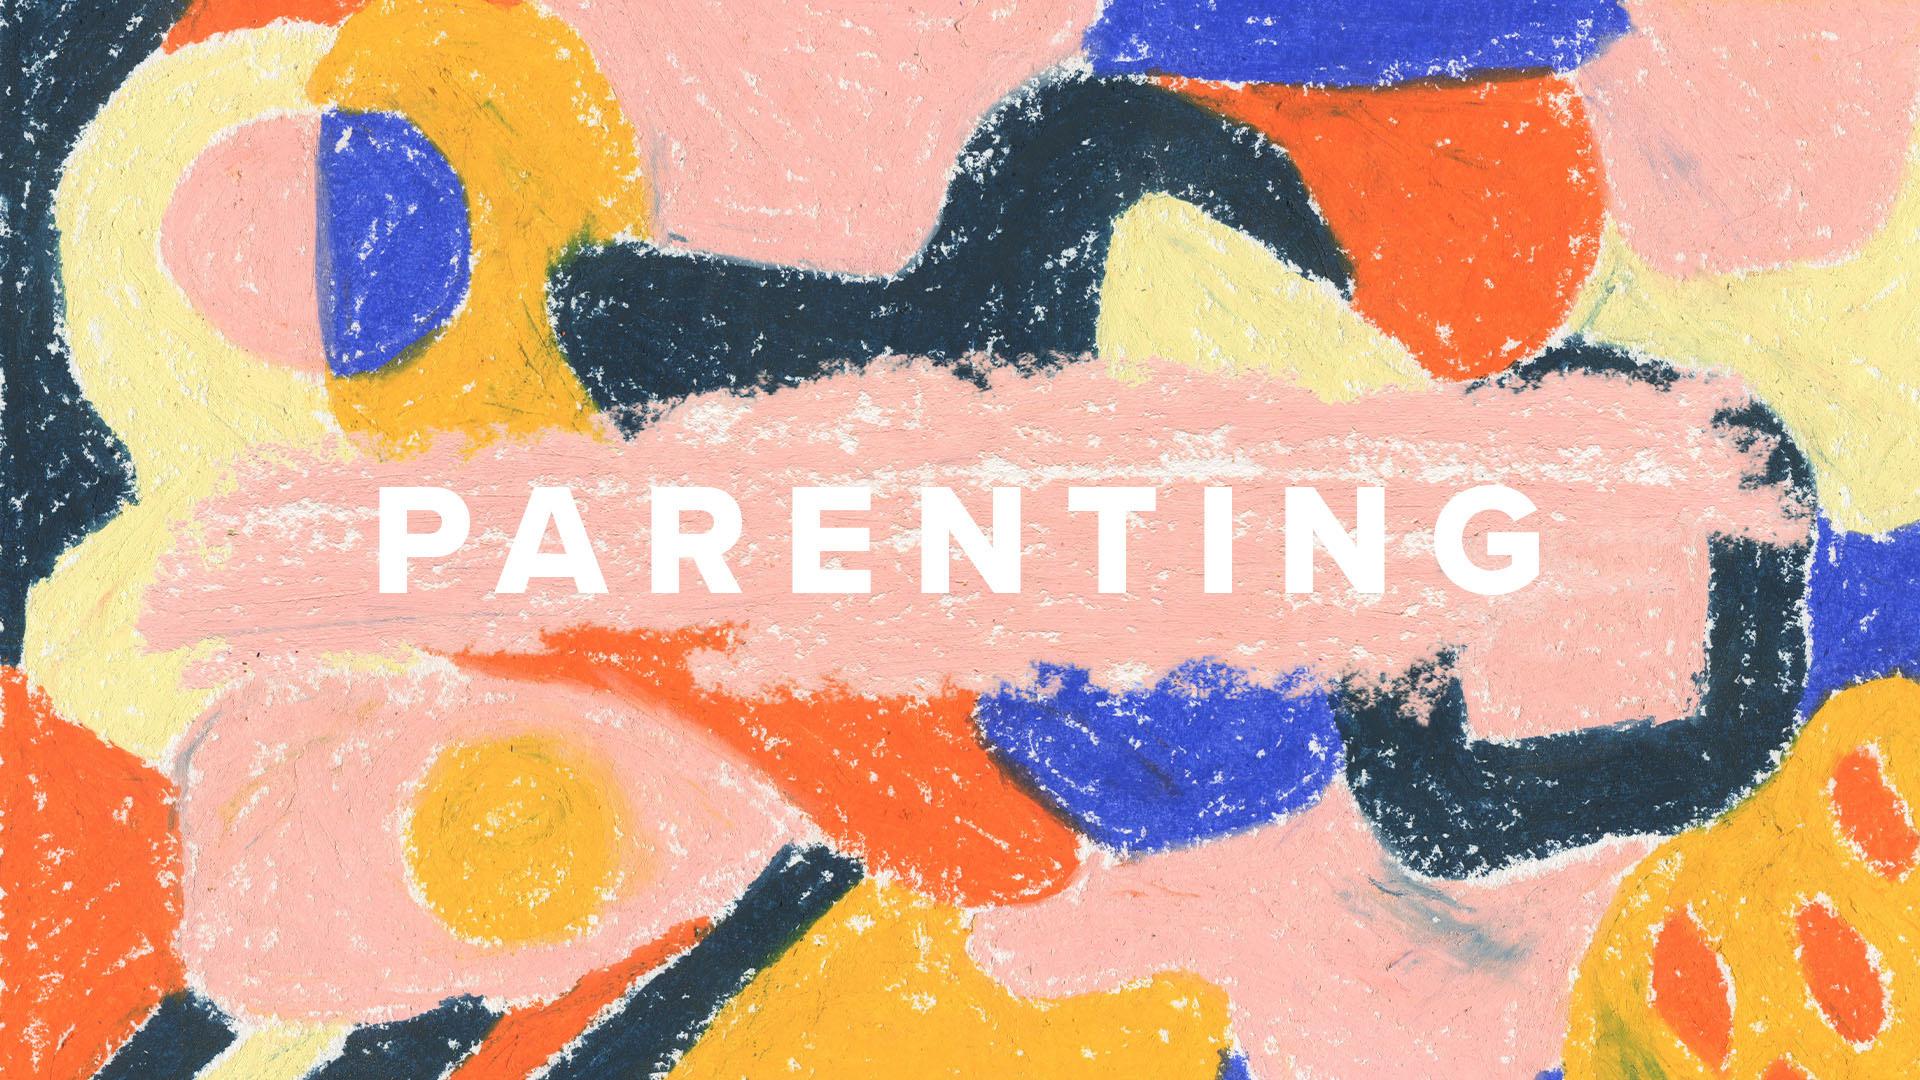 Series: Parenting